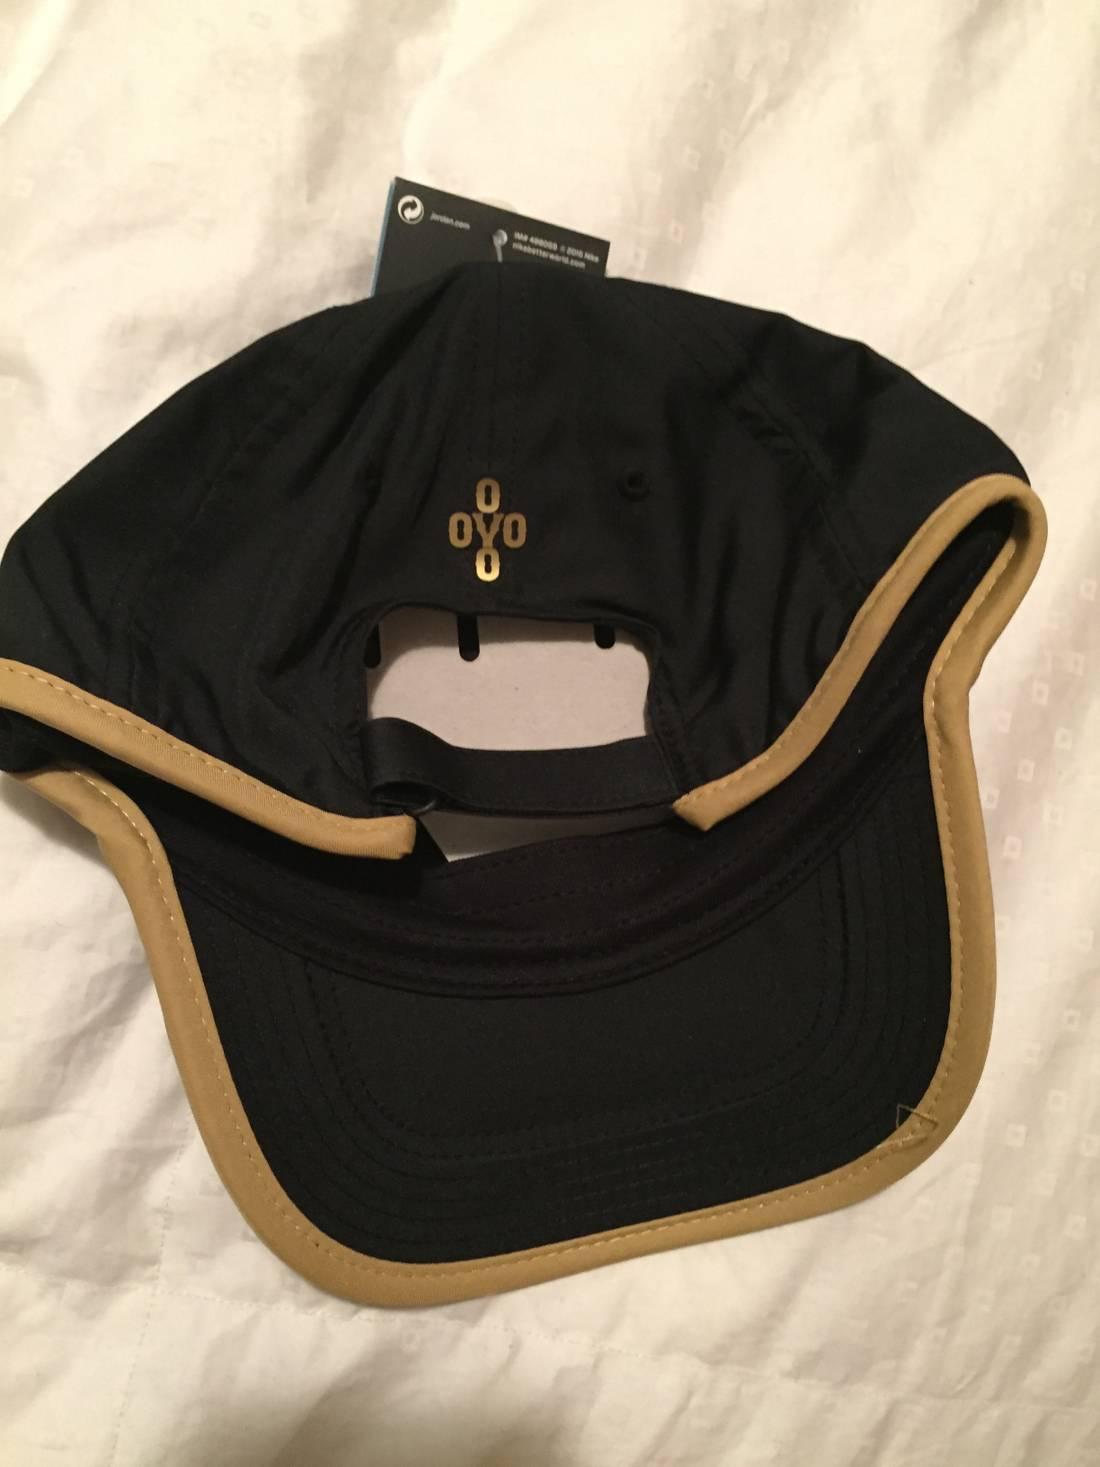 fa03eebf1a7 ... wholesale jordan brand ovo x jordan jumpman runner cap size one size 1  a3676 256e4